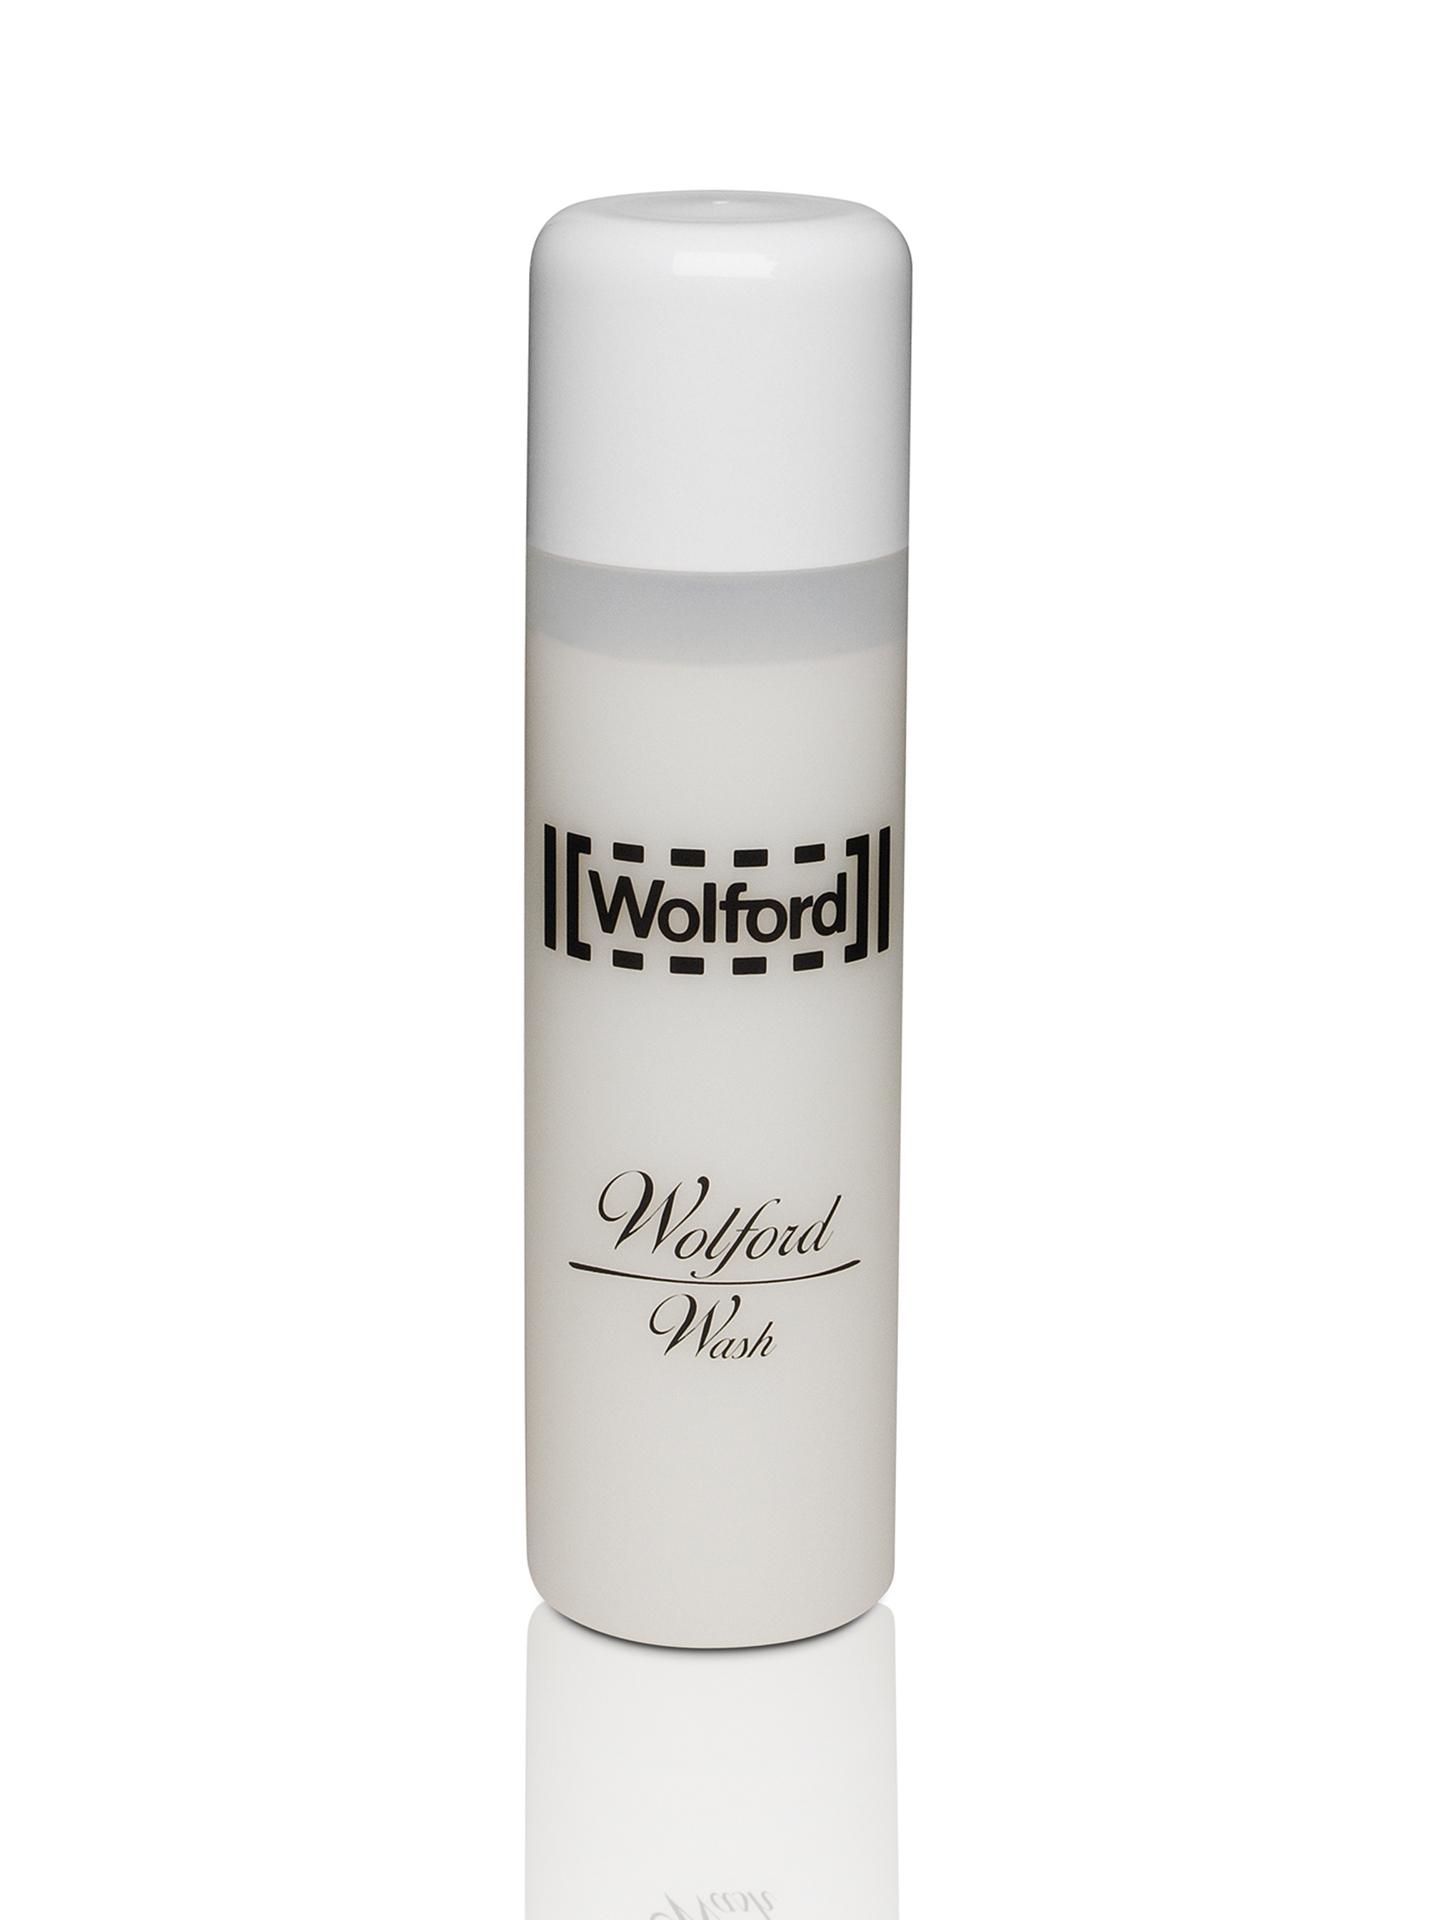 Wolford Wash - 9996 - XXXX